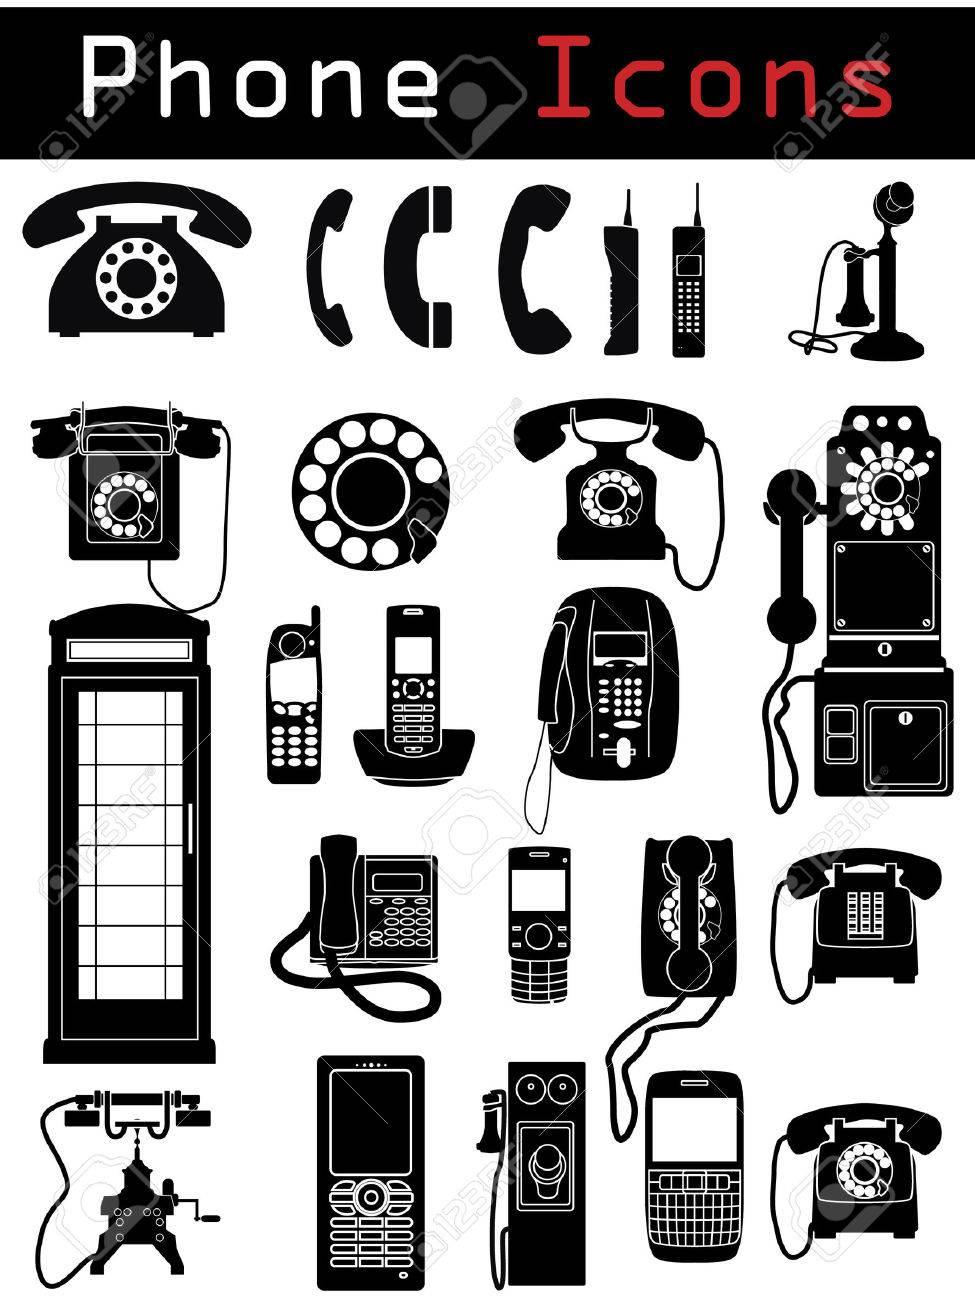 Phone Icons Stock Vector - 6716828